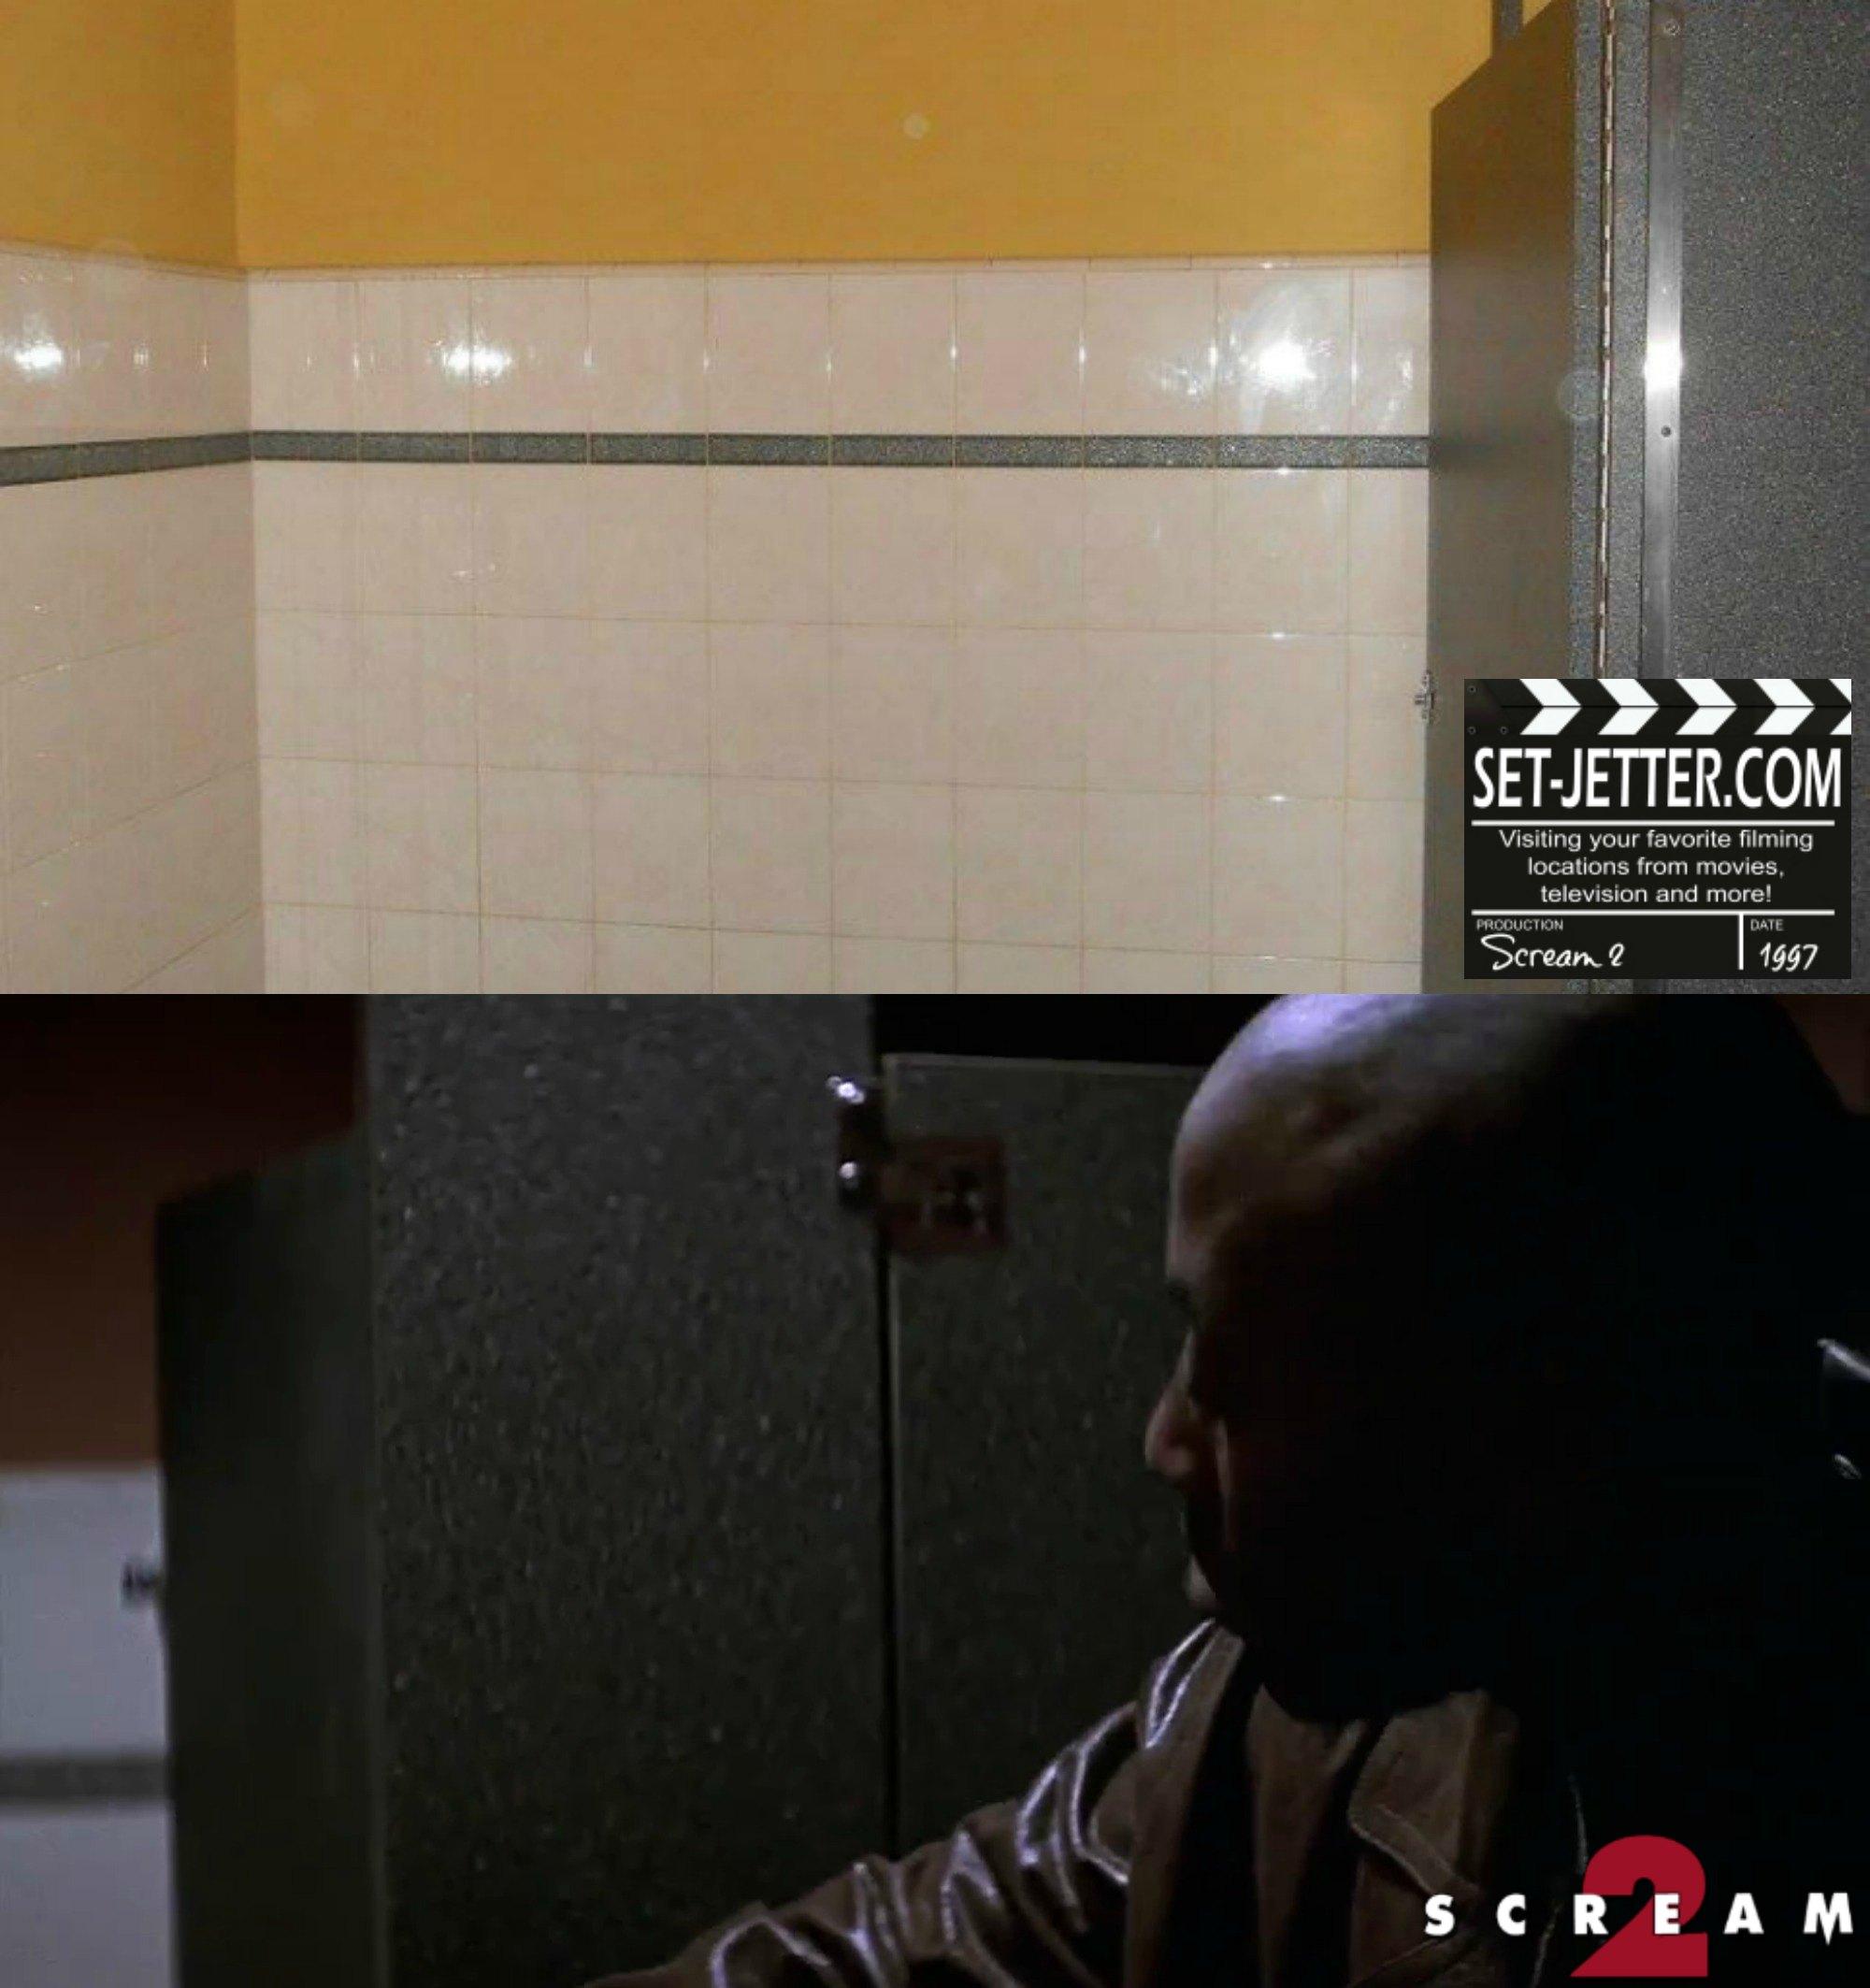 Scream 2 comparison 17.jpg